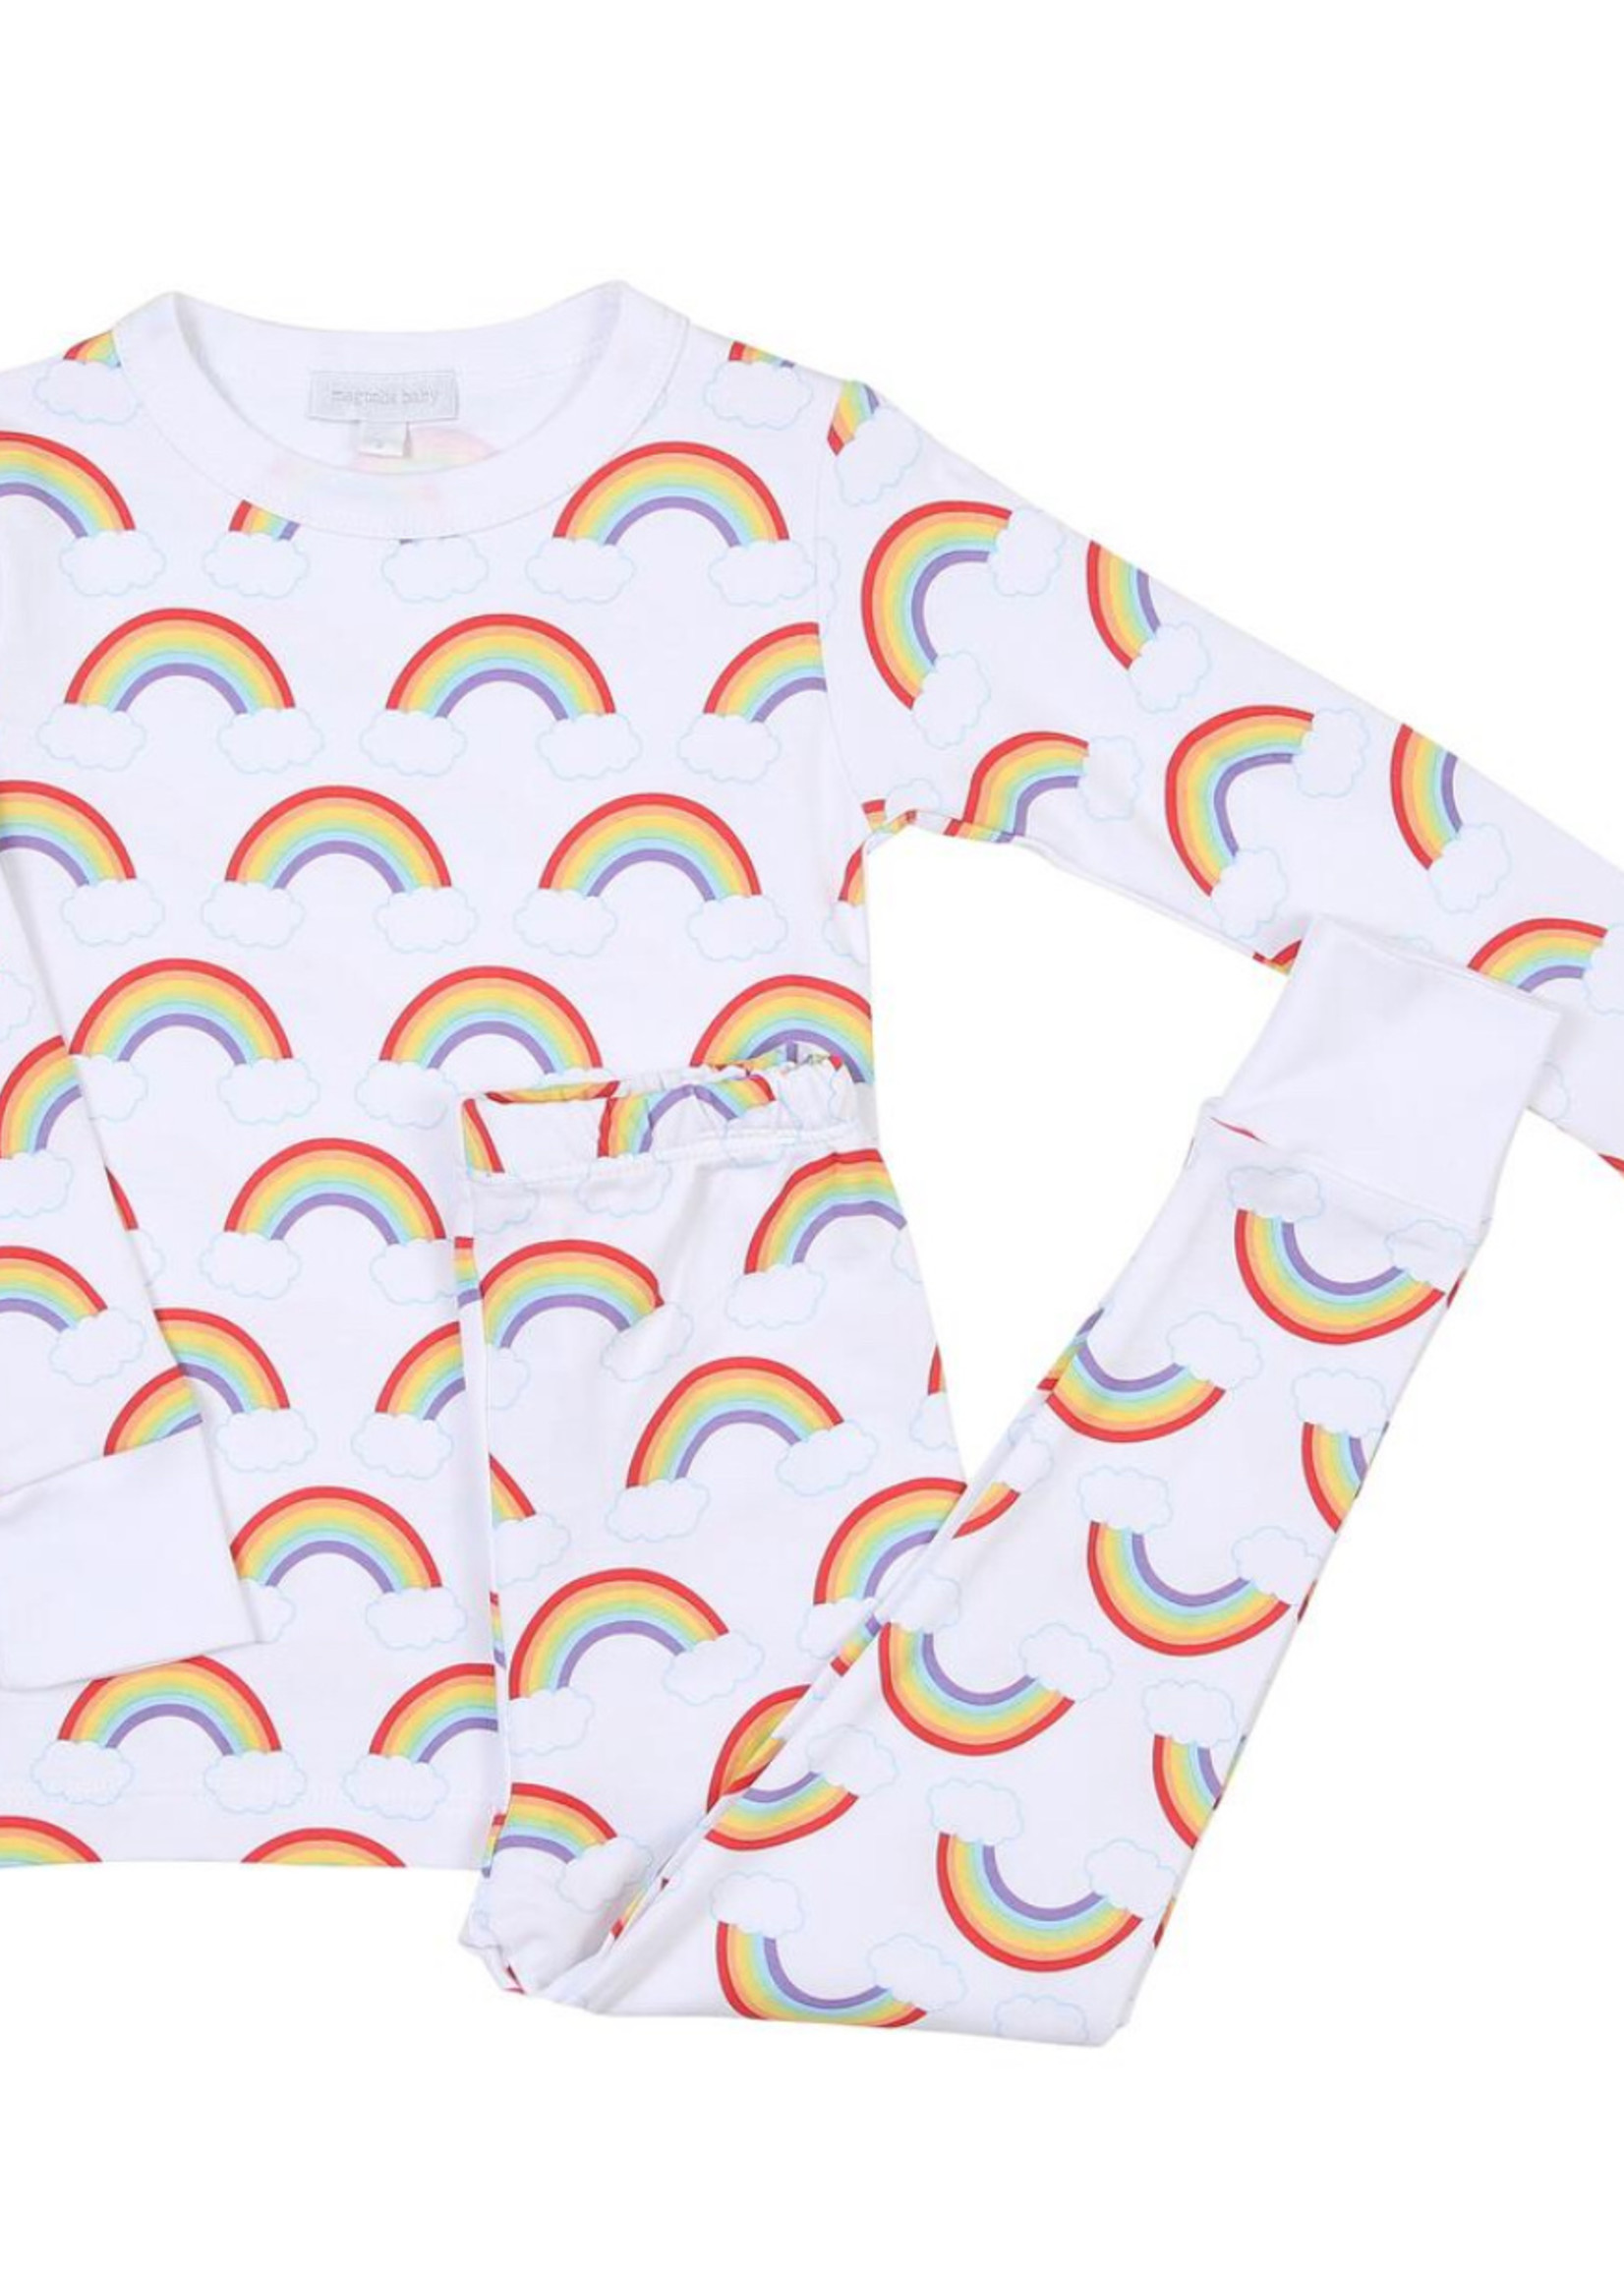 magnolia baby My Rainbow Long Sleeve Pajama